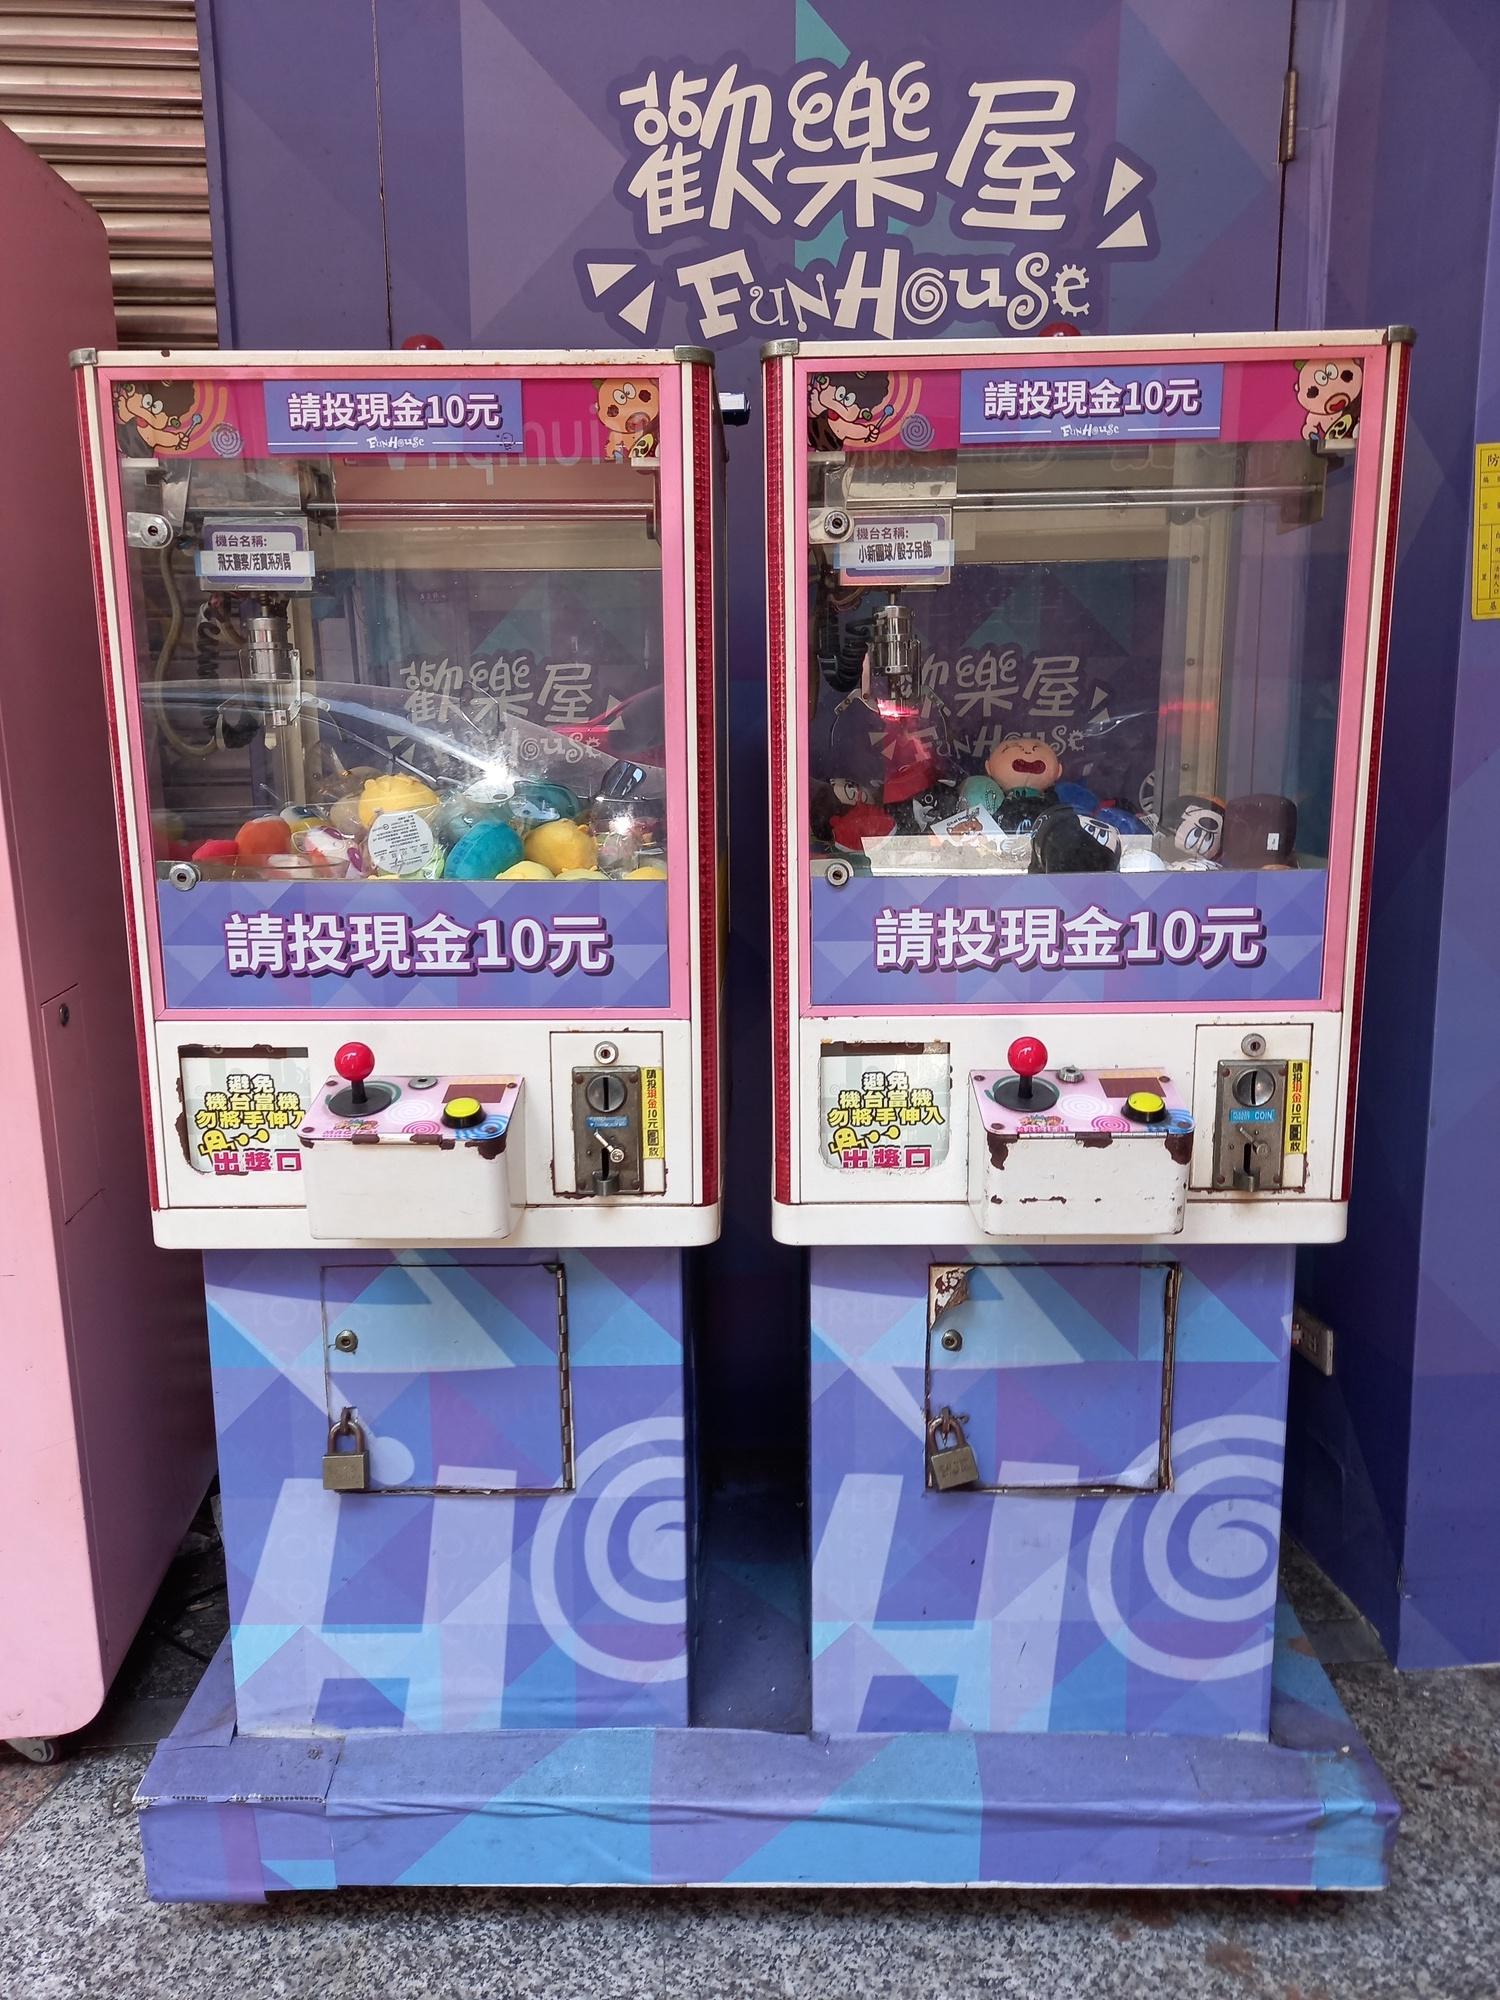 Claw machines, Taiwan